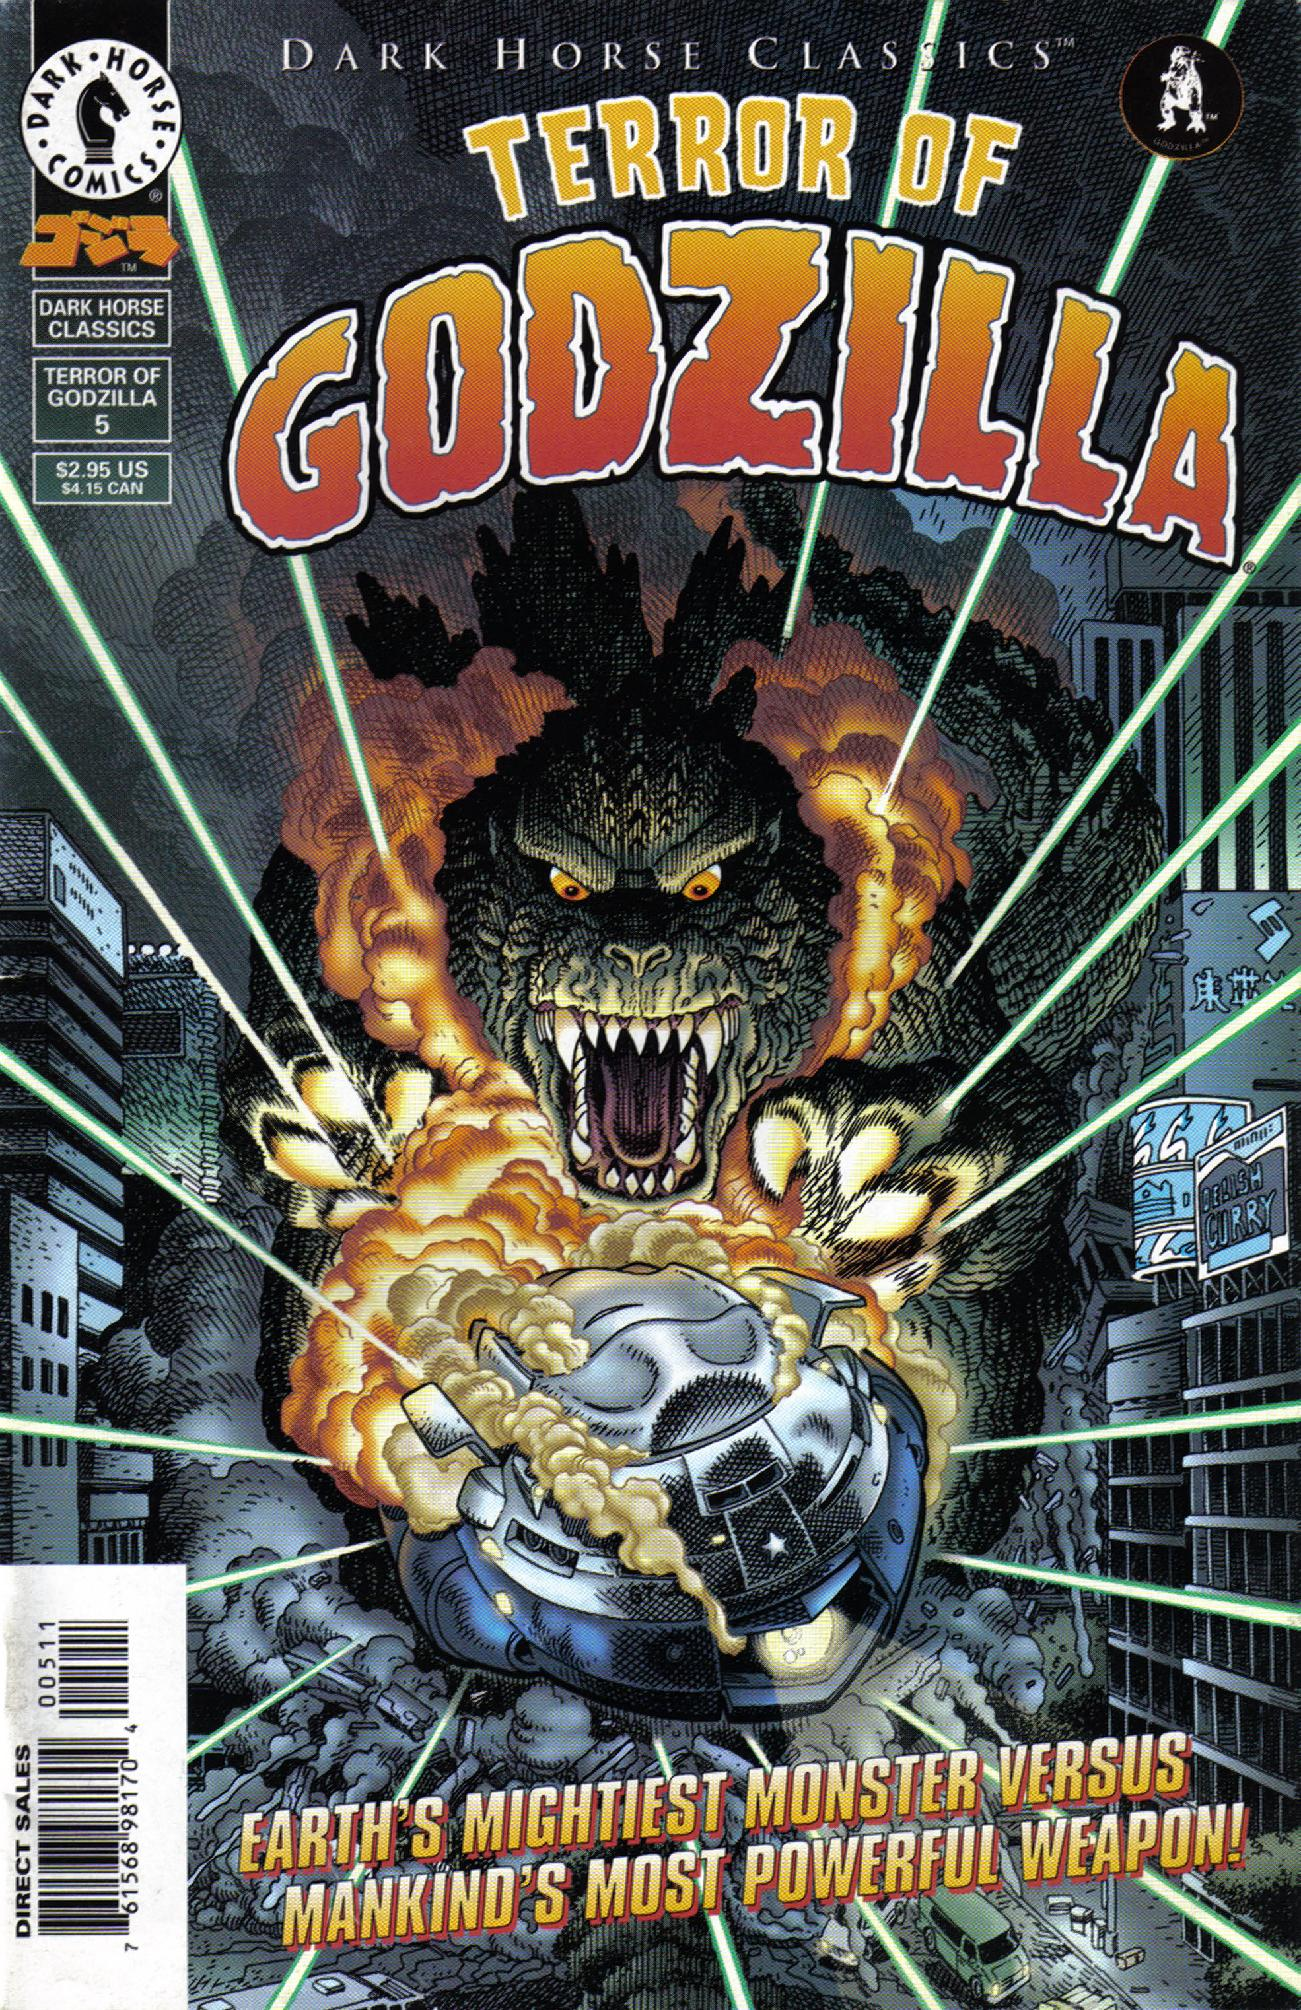 Read online Dark Horse Classics: Terror of Godzilla comic -  Issue #5 - 1